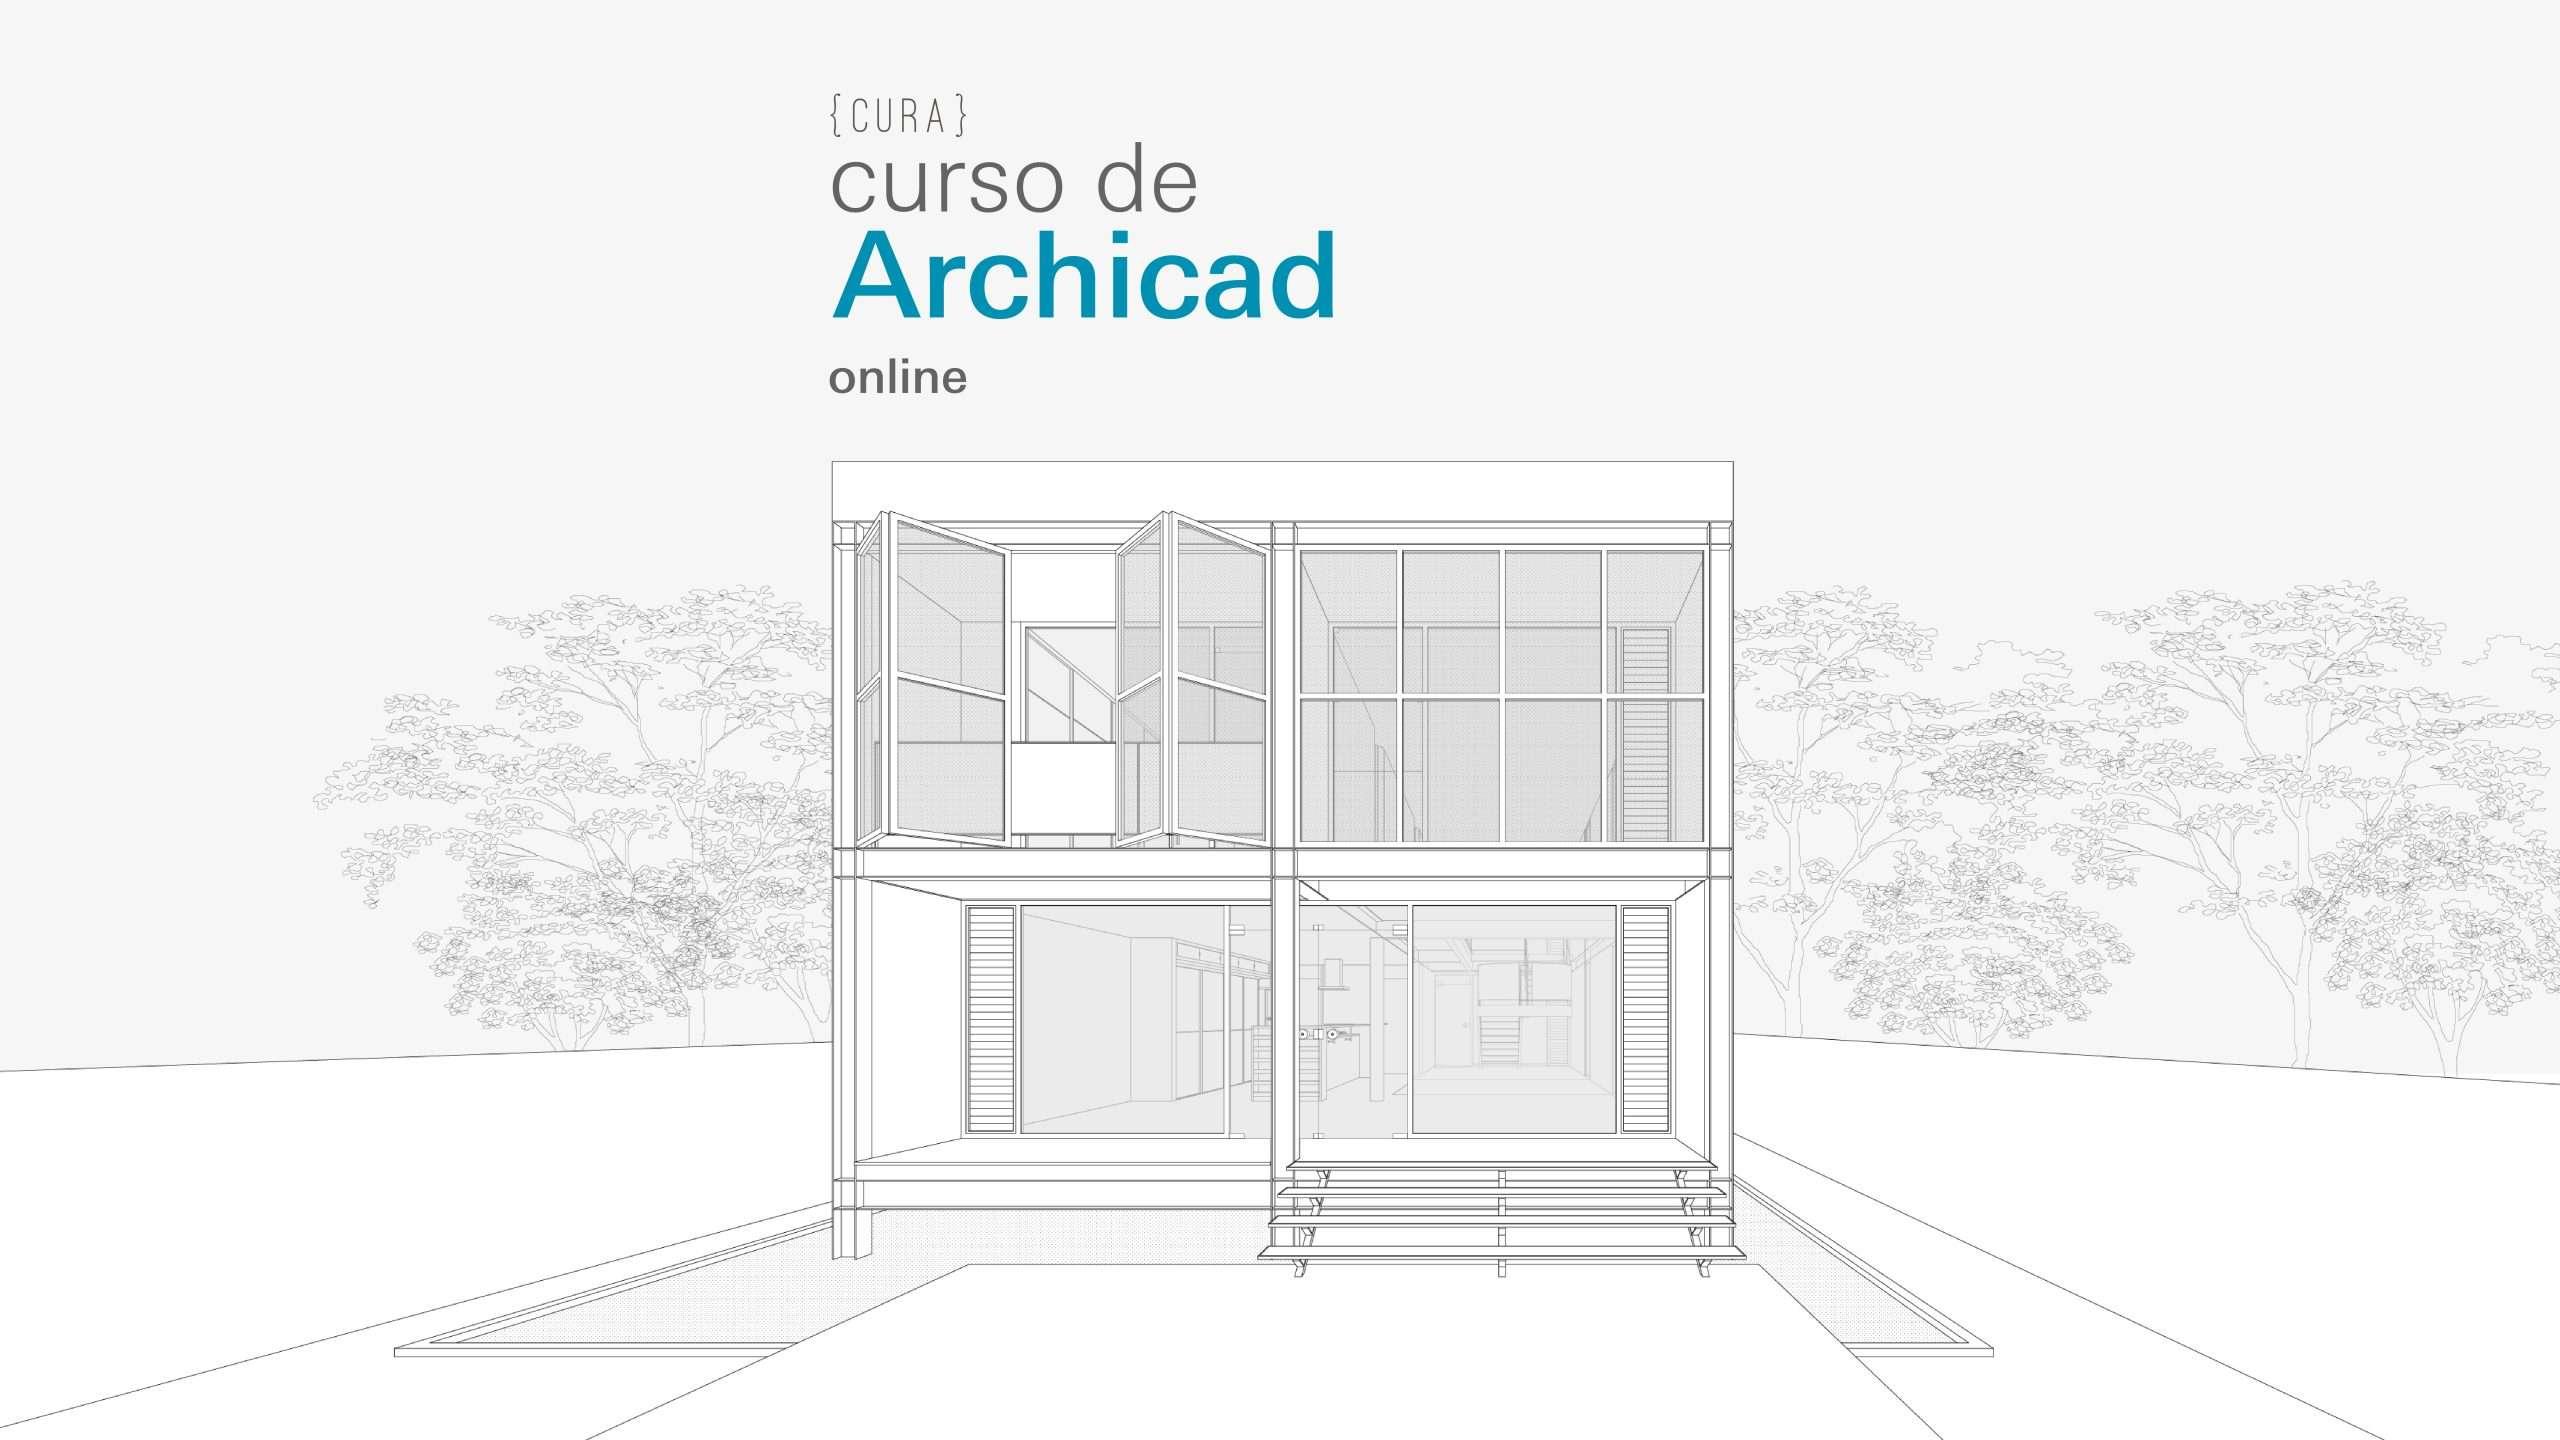 Archicad {CURA} | Online